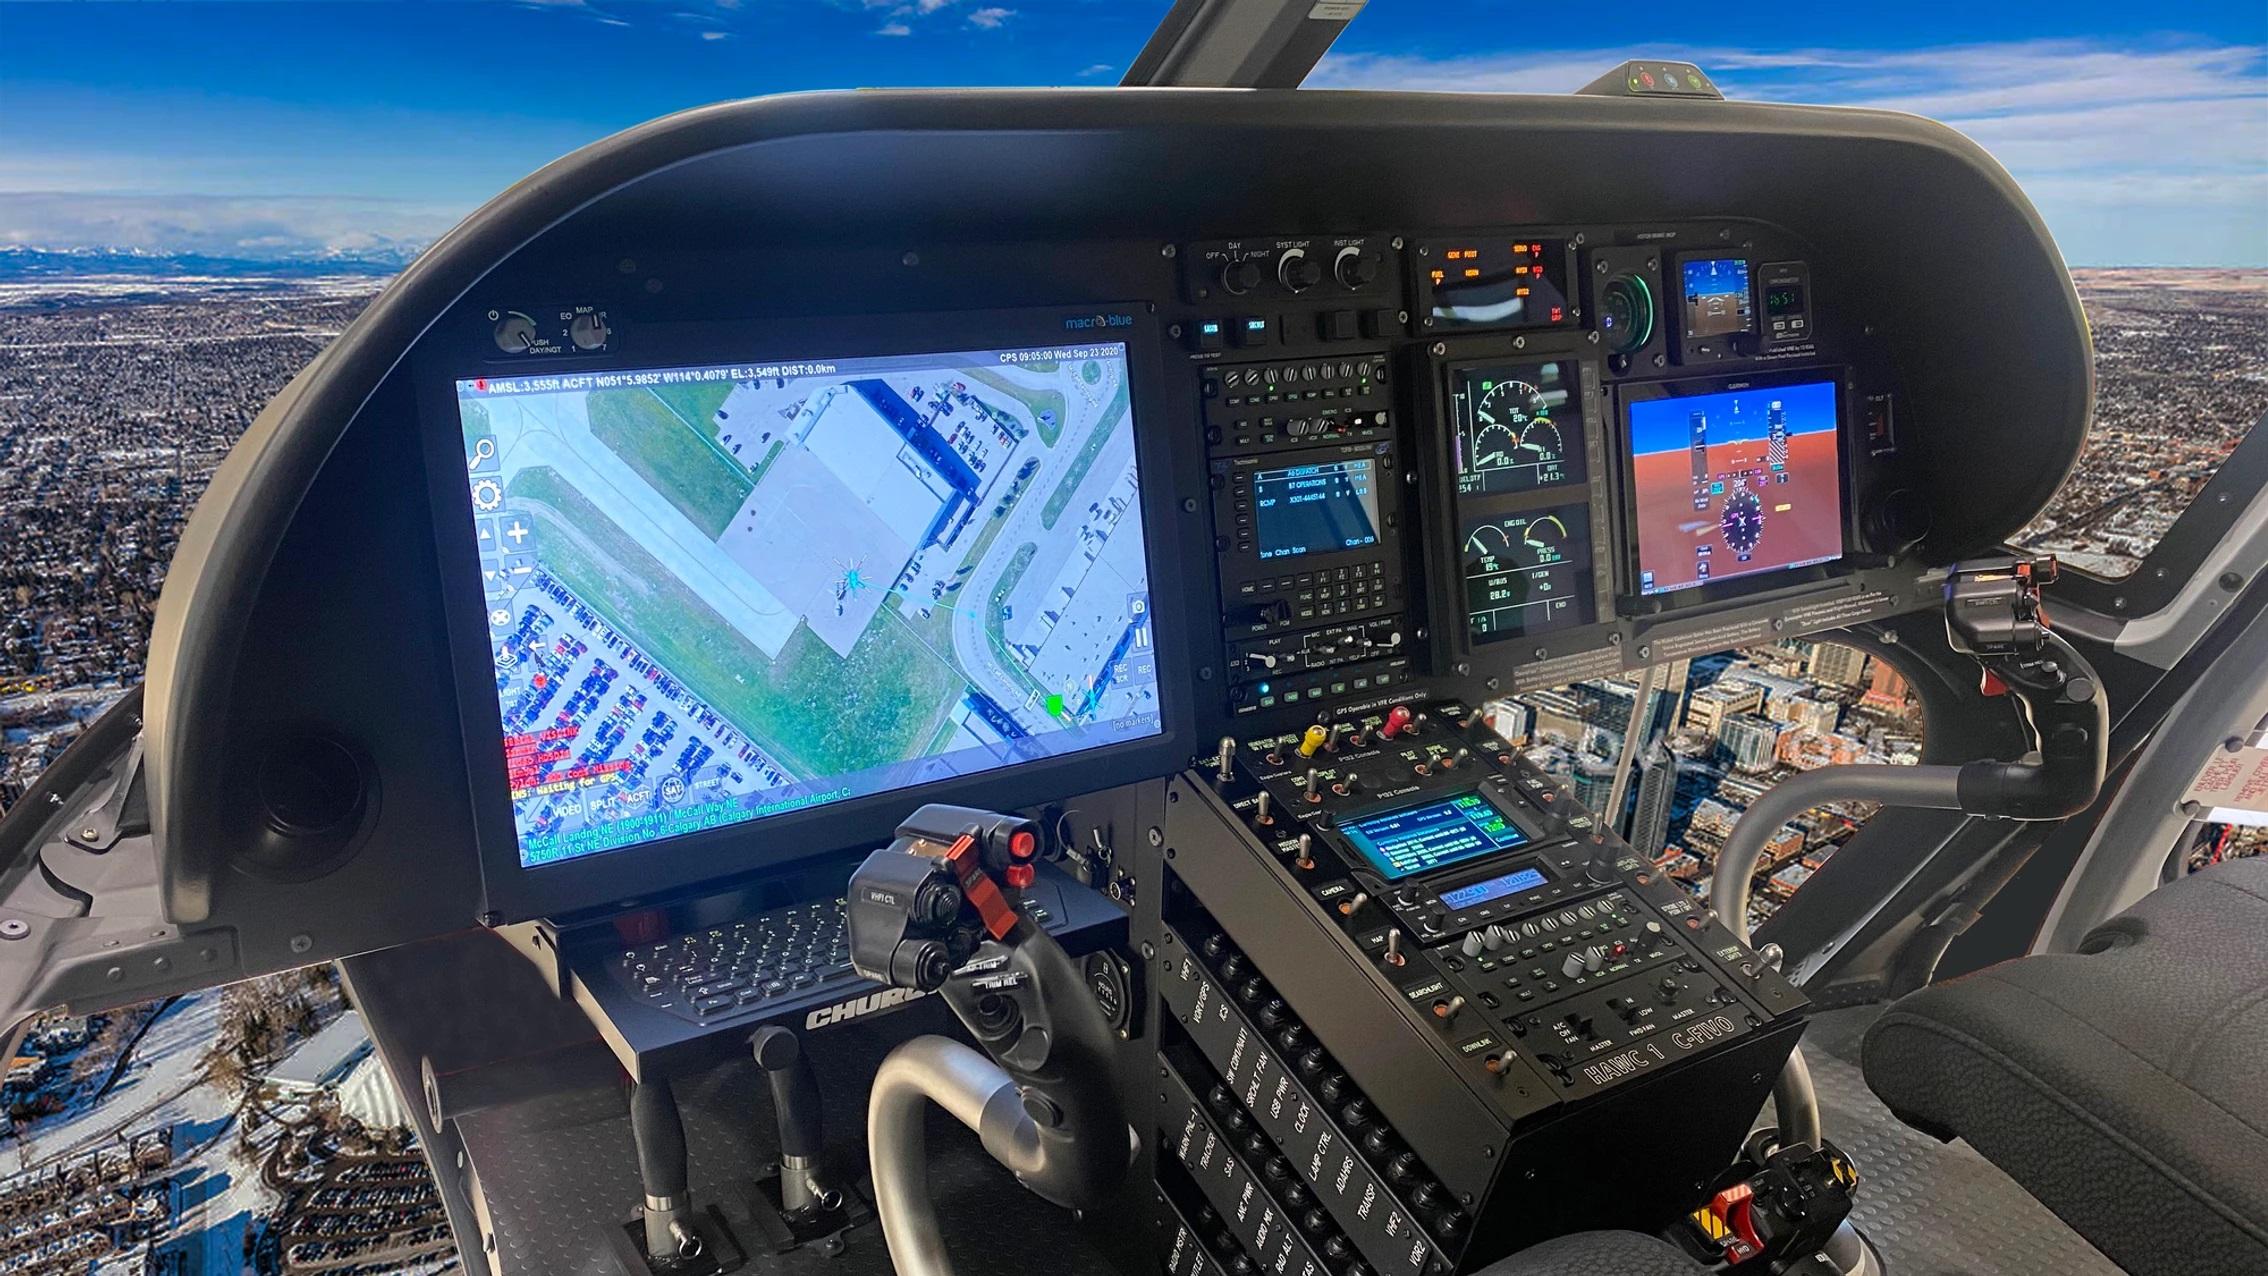 Dallas Avionics to sell AEM digital audio systems